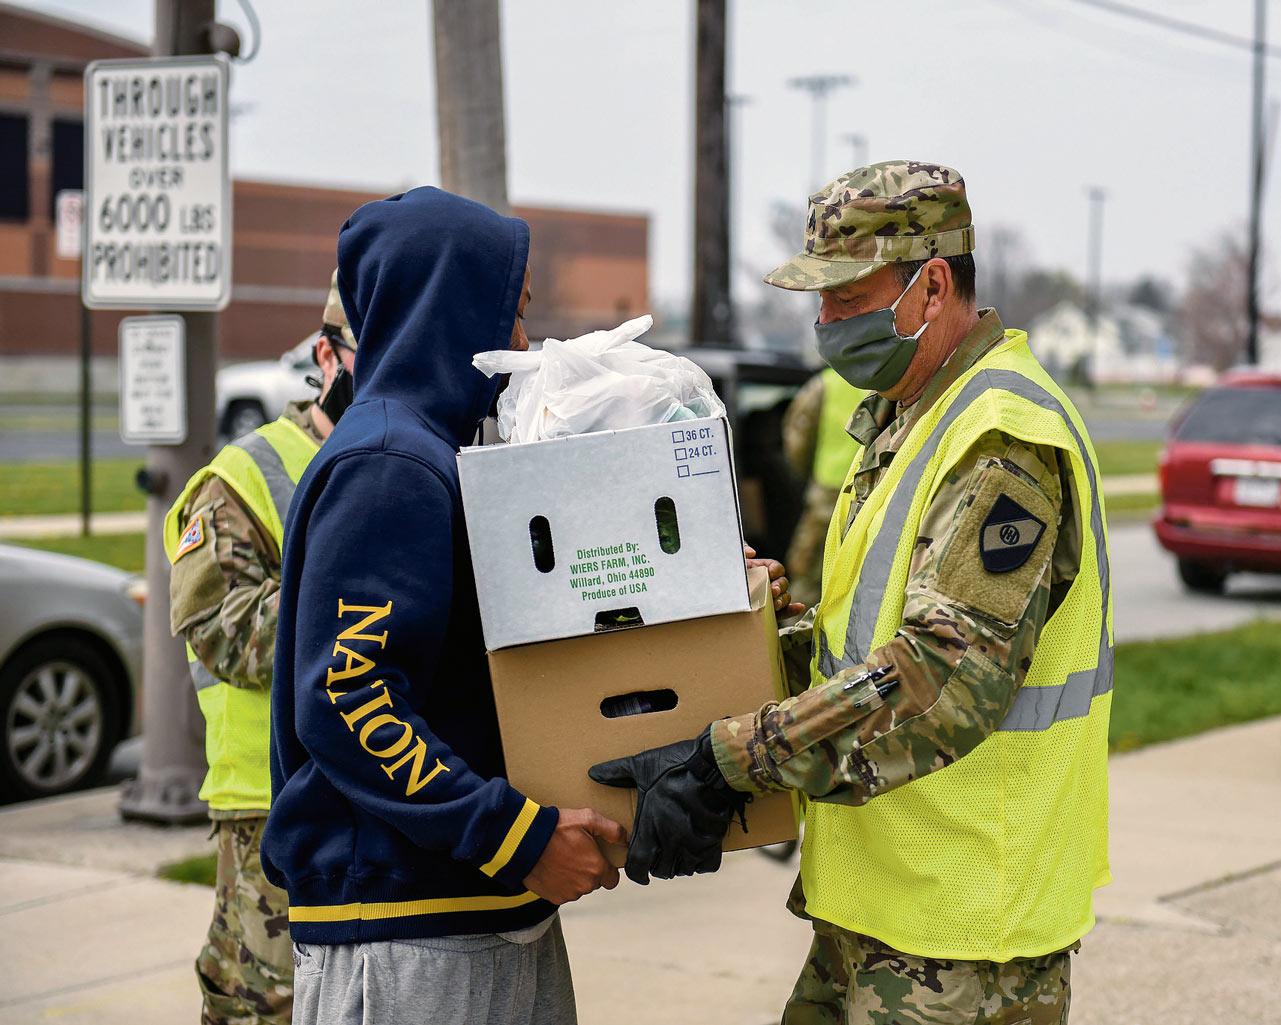 Distribution alimentaire, Caroline du Sud, 24 avril 2020